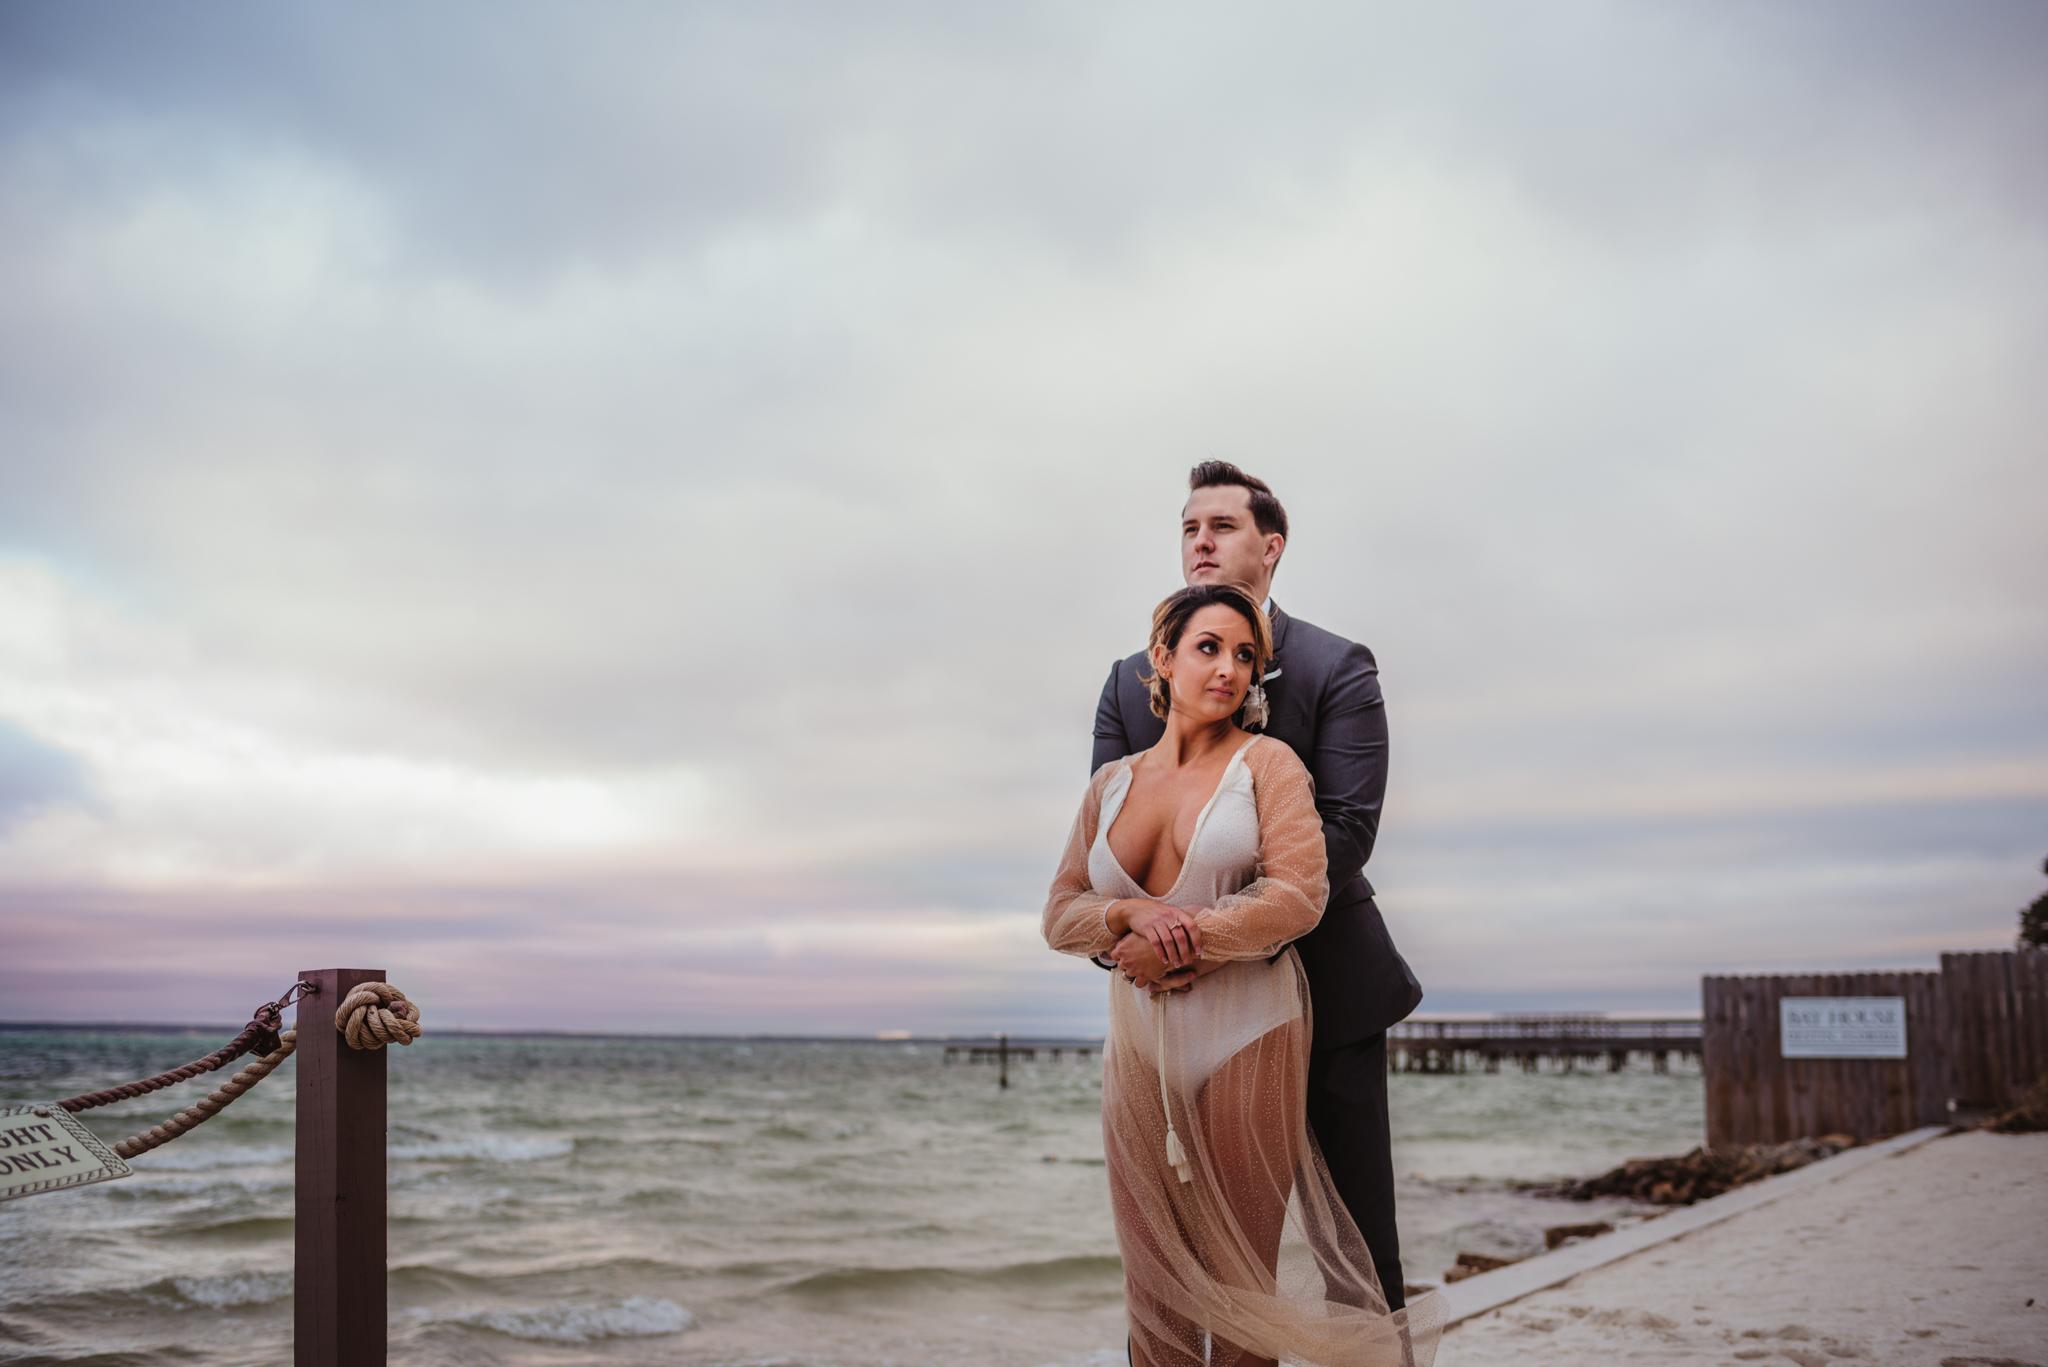 Raleigh-wedding-photography-beach-wedding-portraits-7.jpg